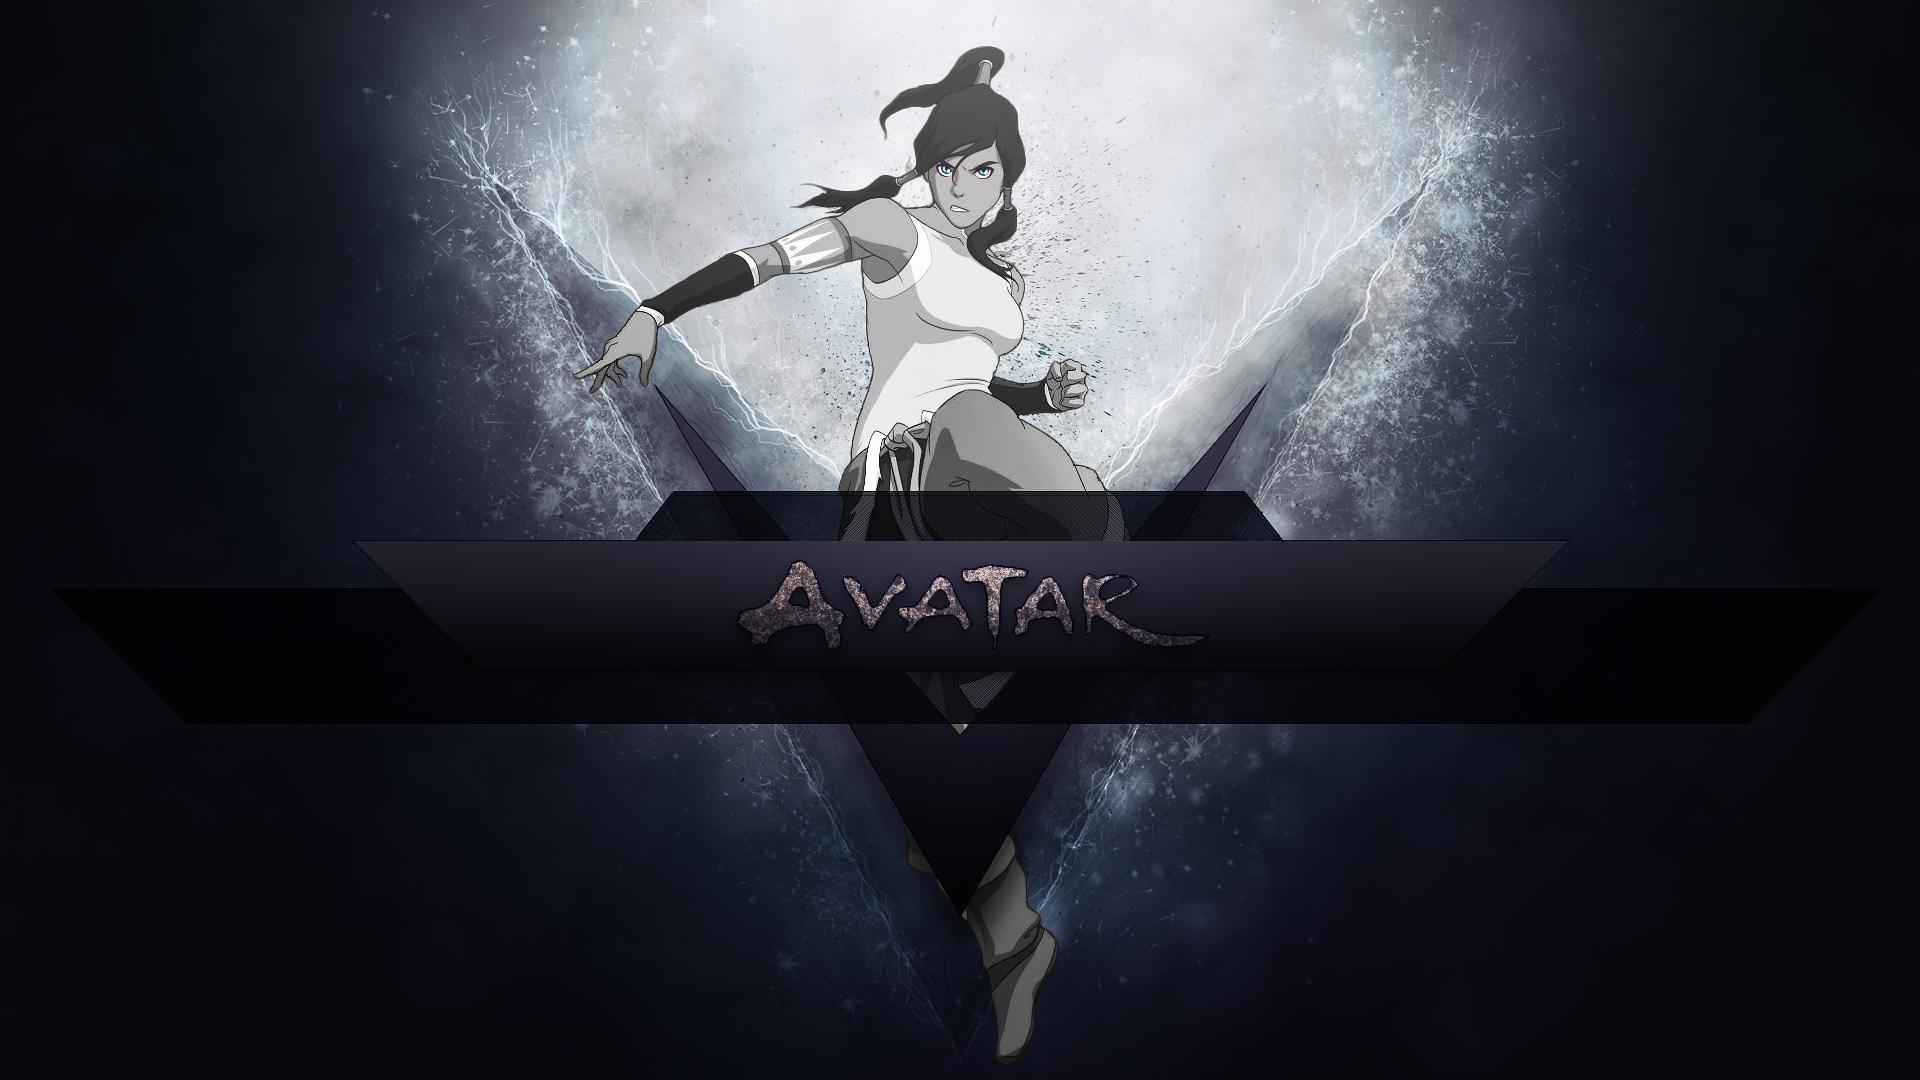 Avatar Korra by SandwichDelta